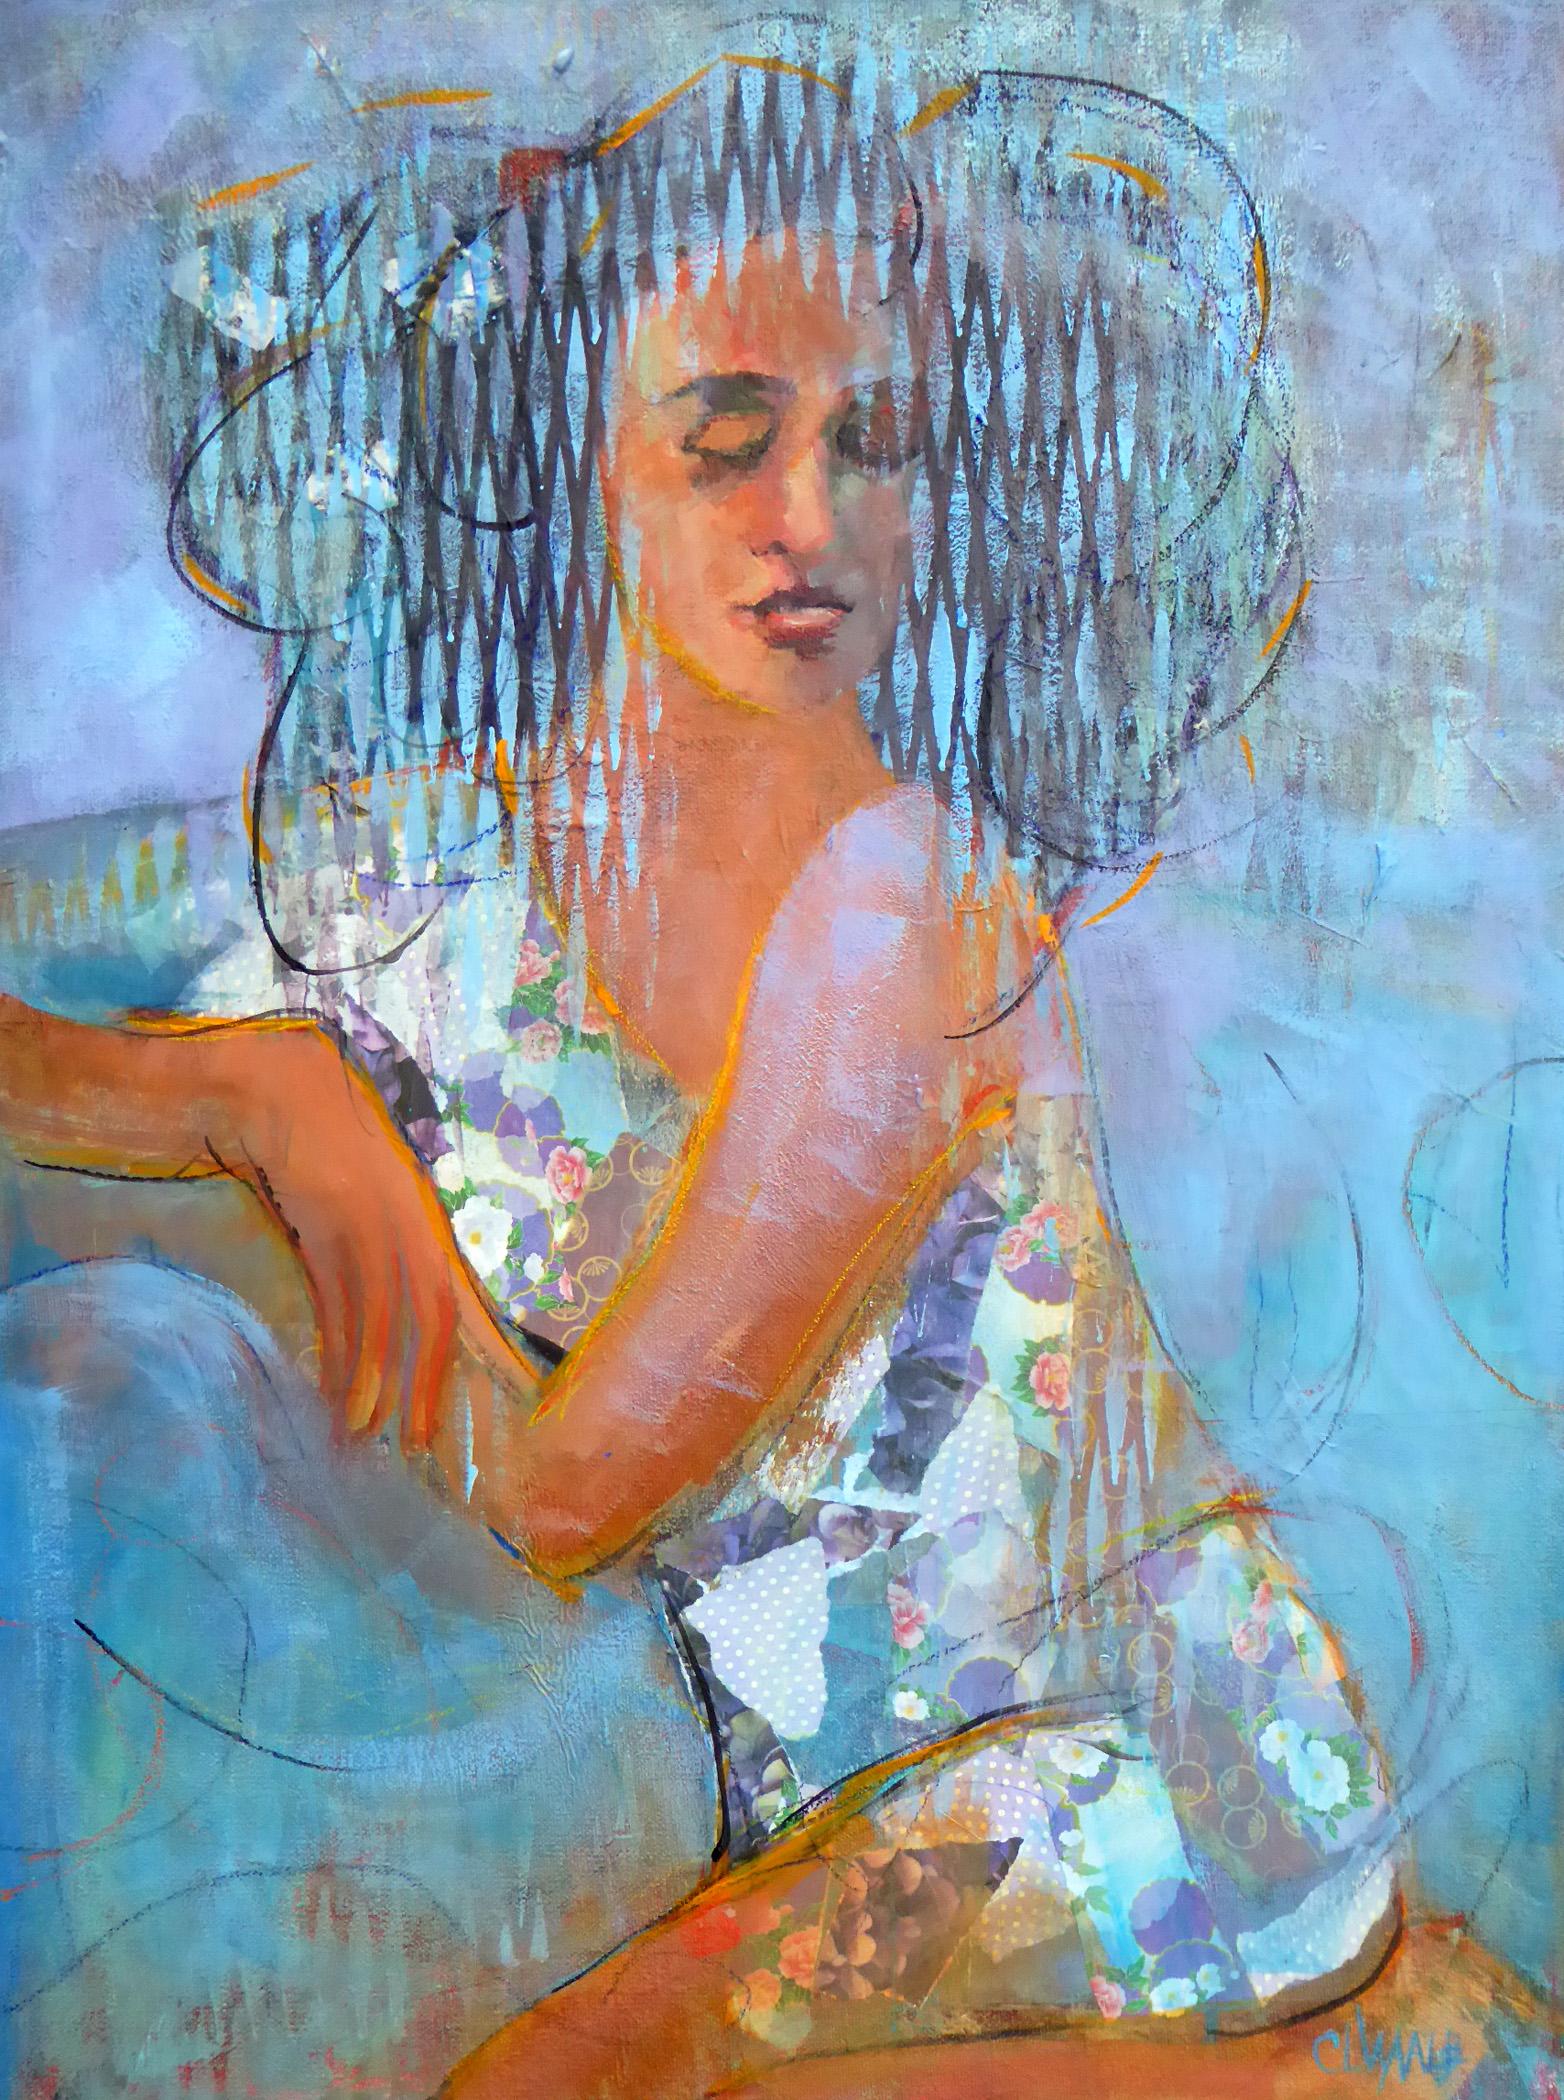 Beyond the Veil by Cheryl Waale